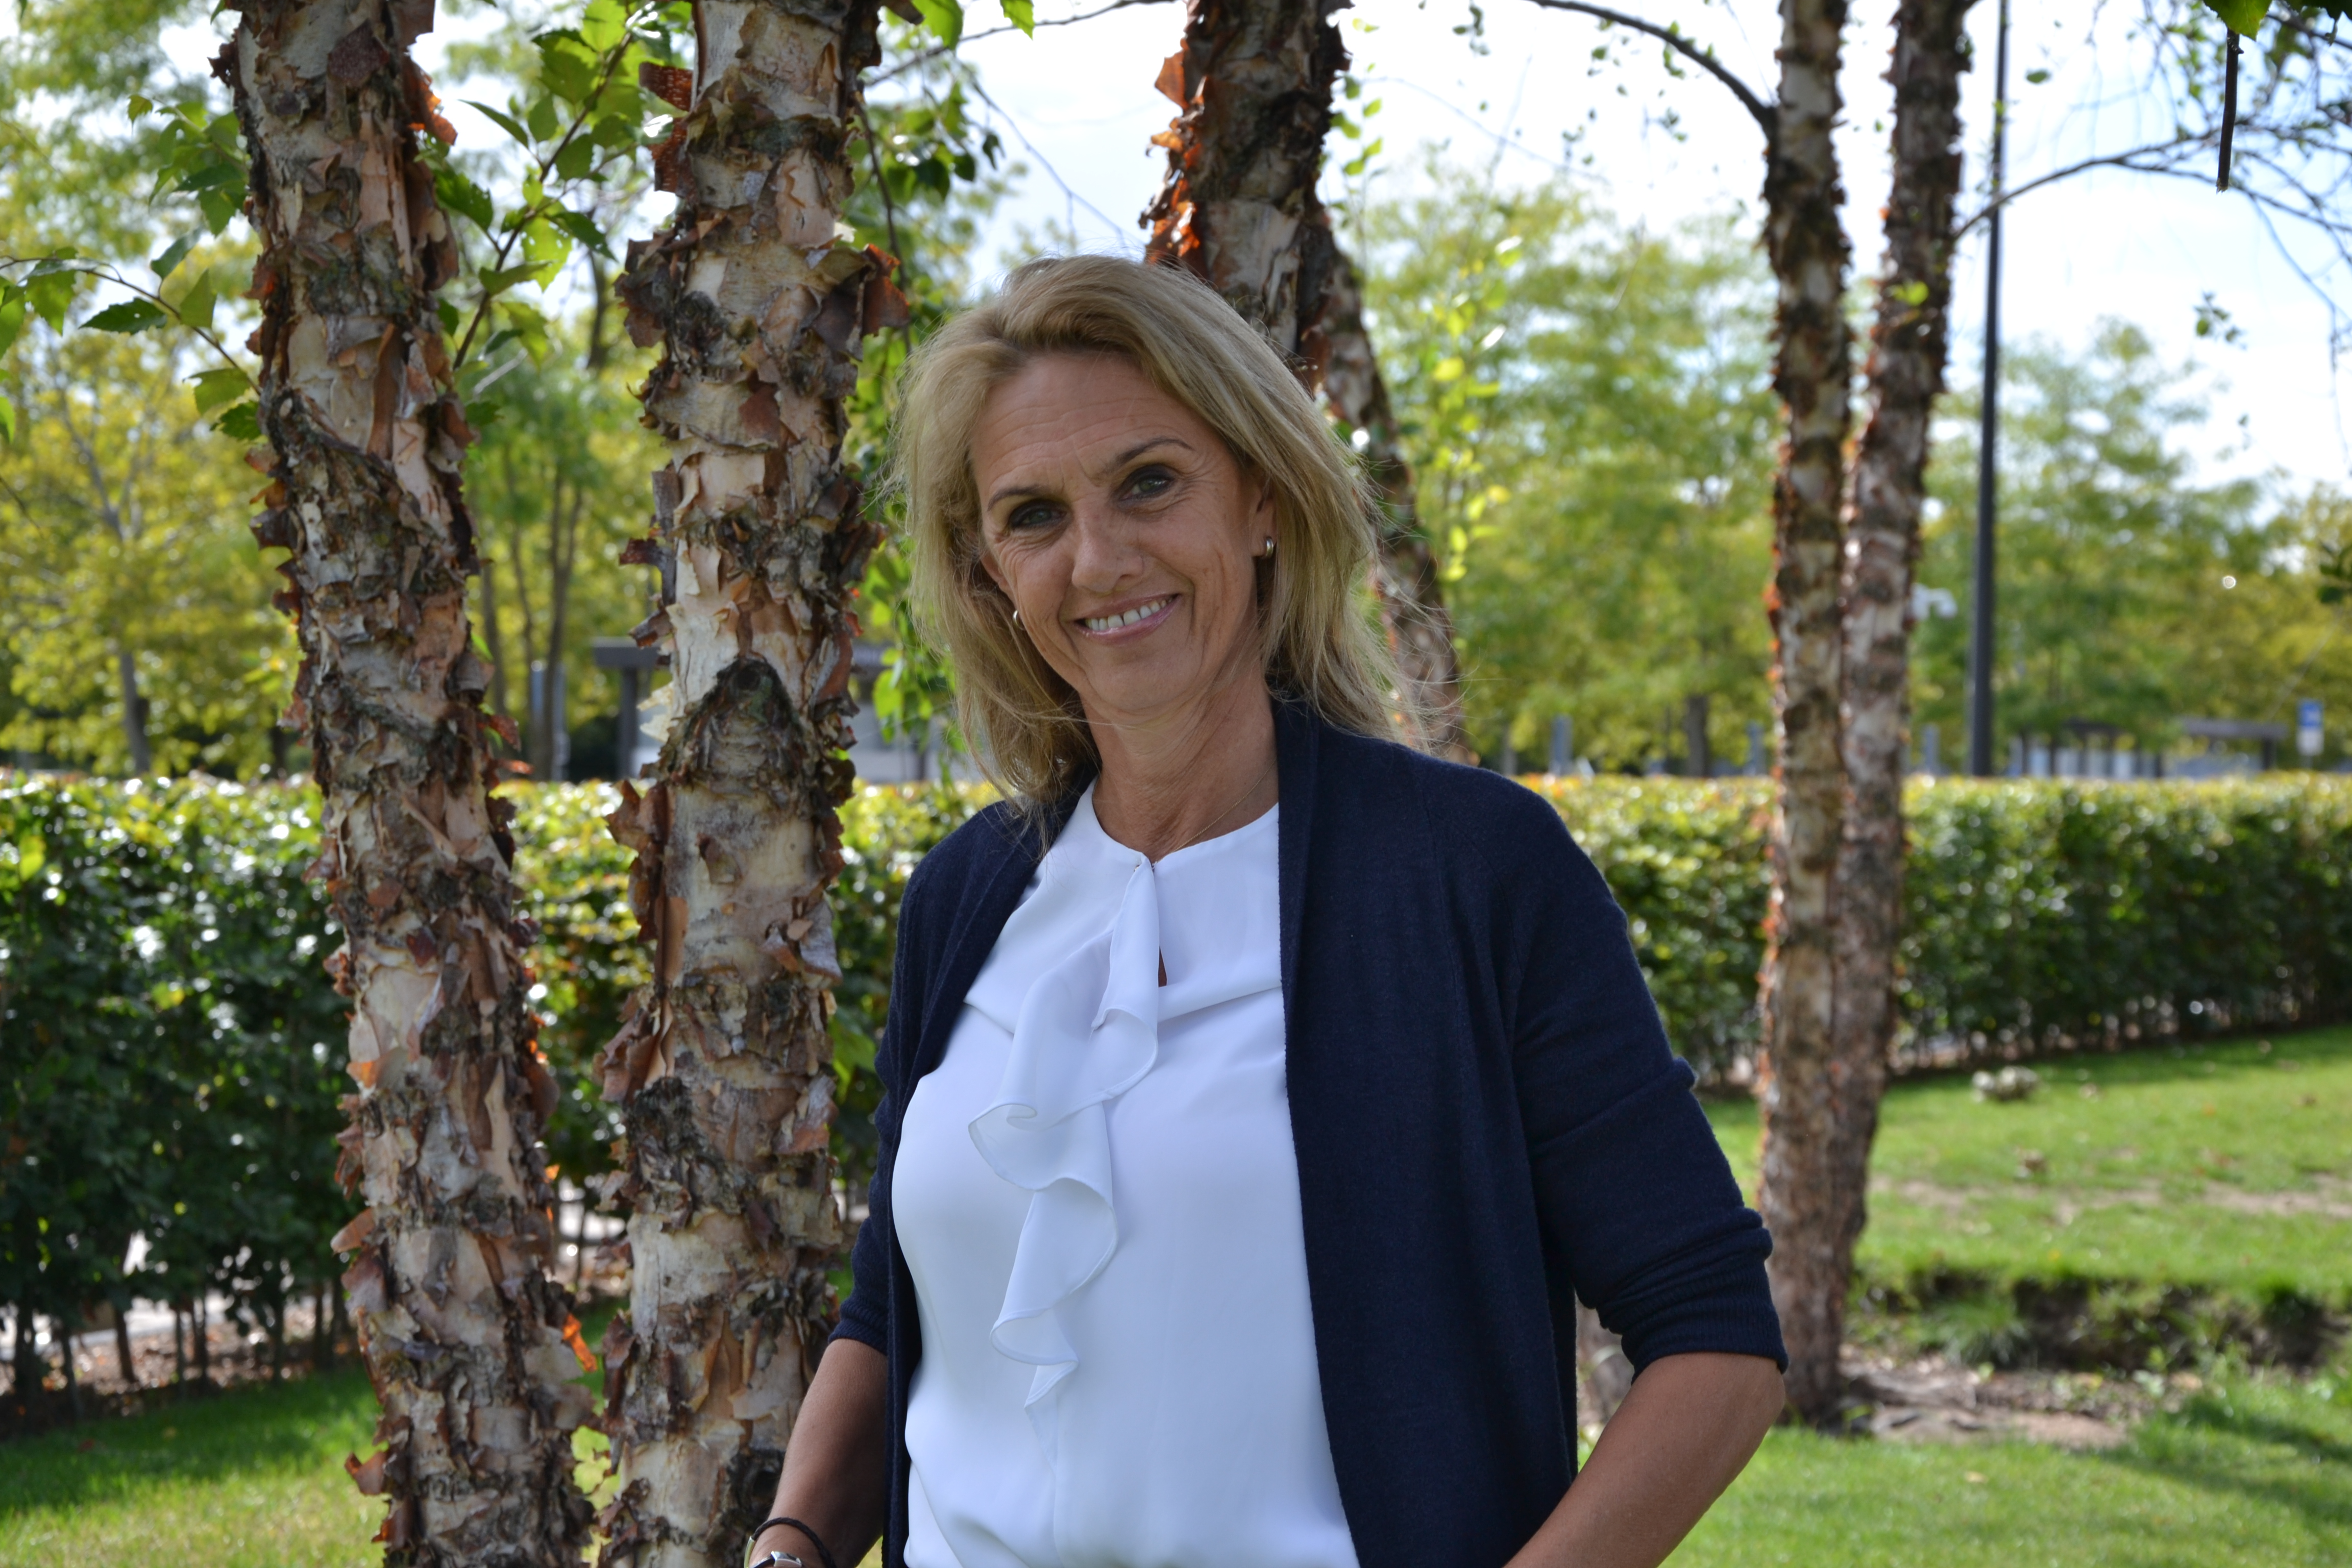 OR-voorzitter Karin Hurkens